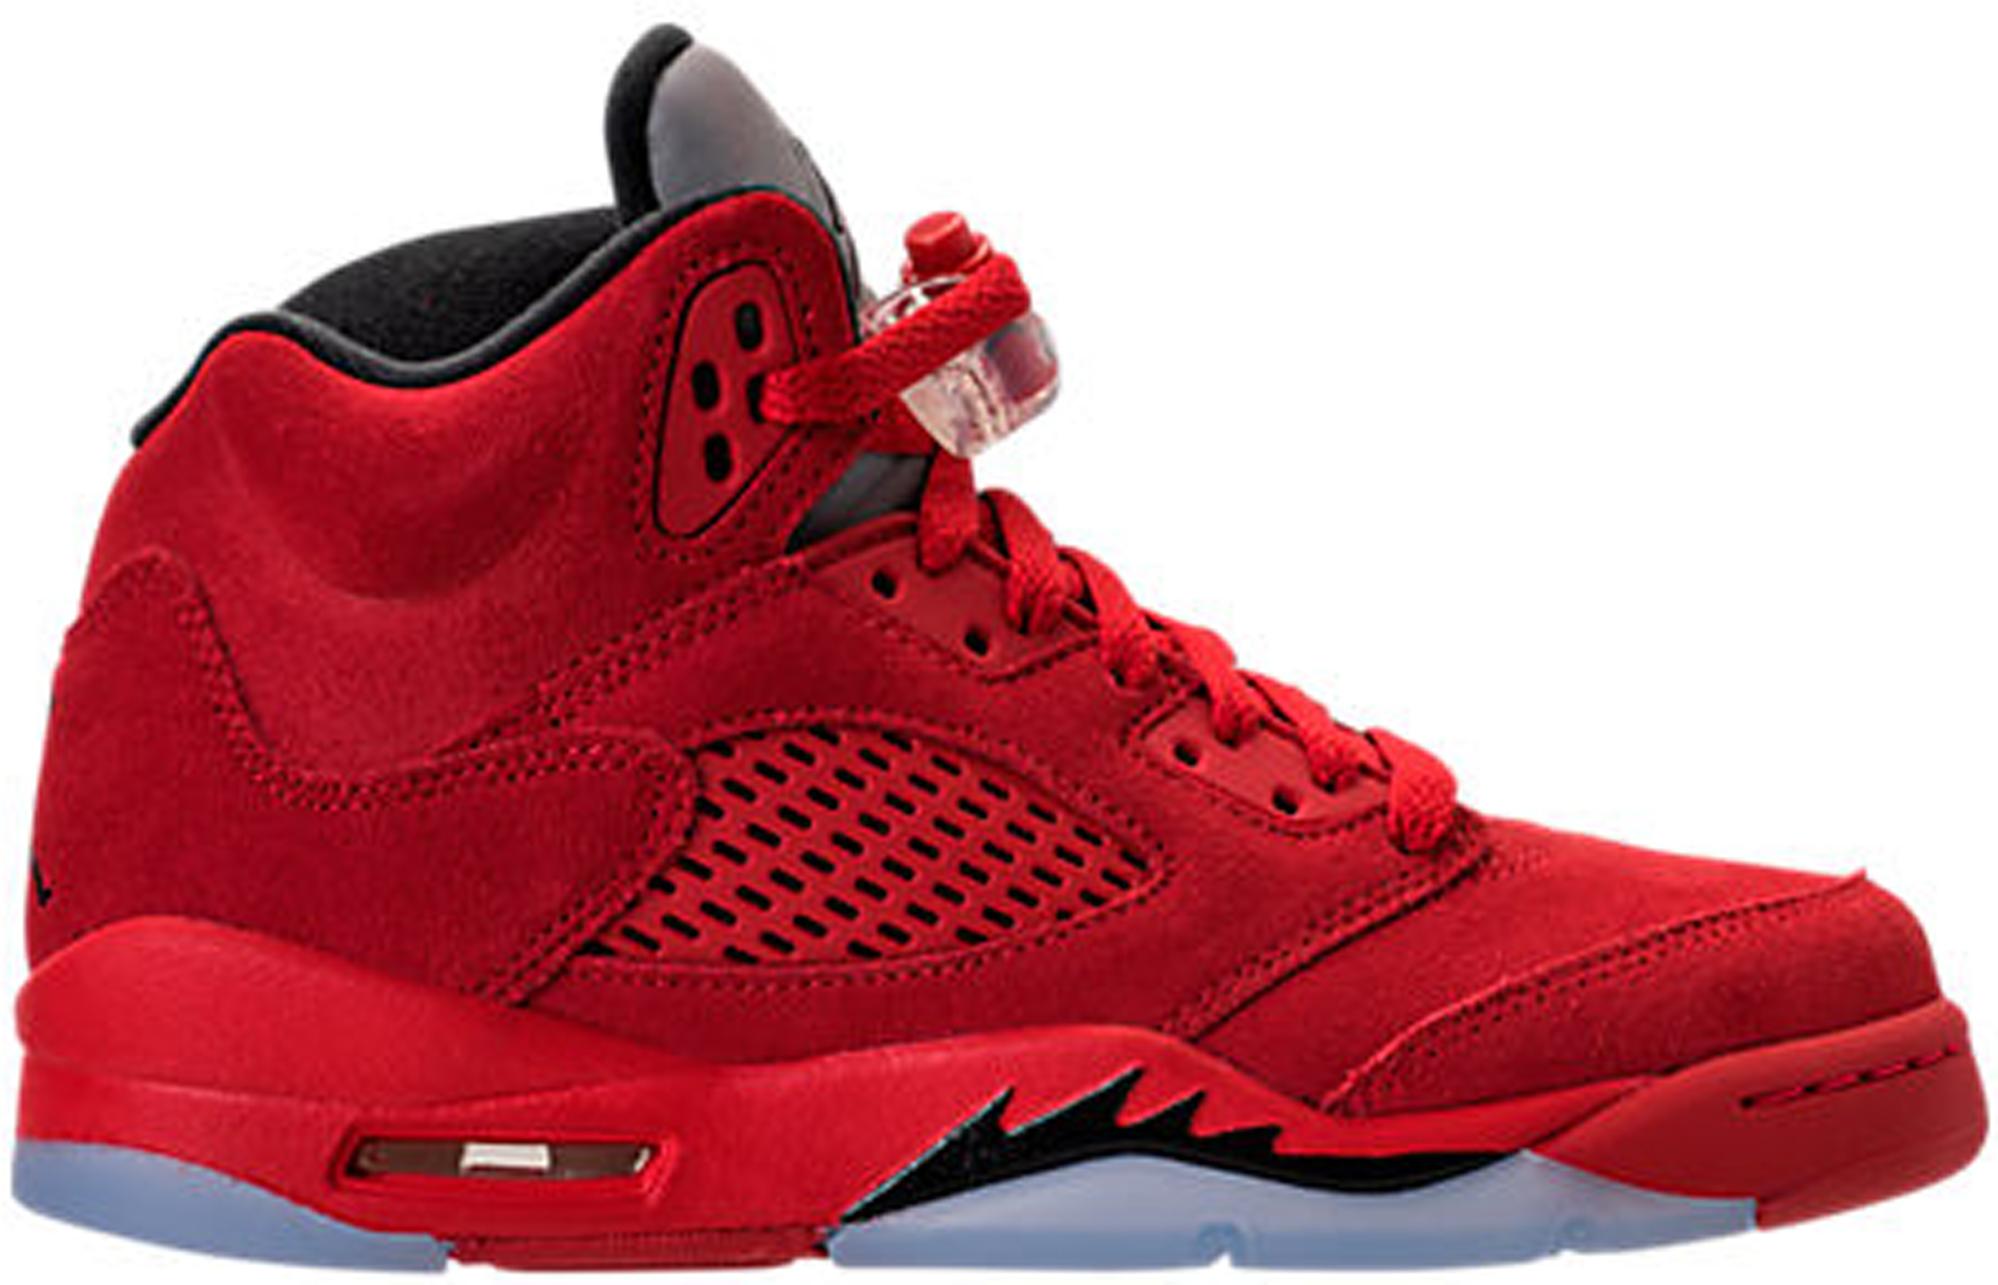 new product b4f58 c4714 ... shop jordan 5 retro red suede gs 583ea 8a976